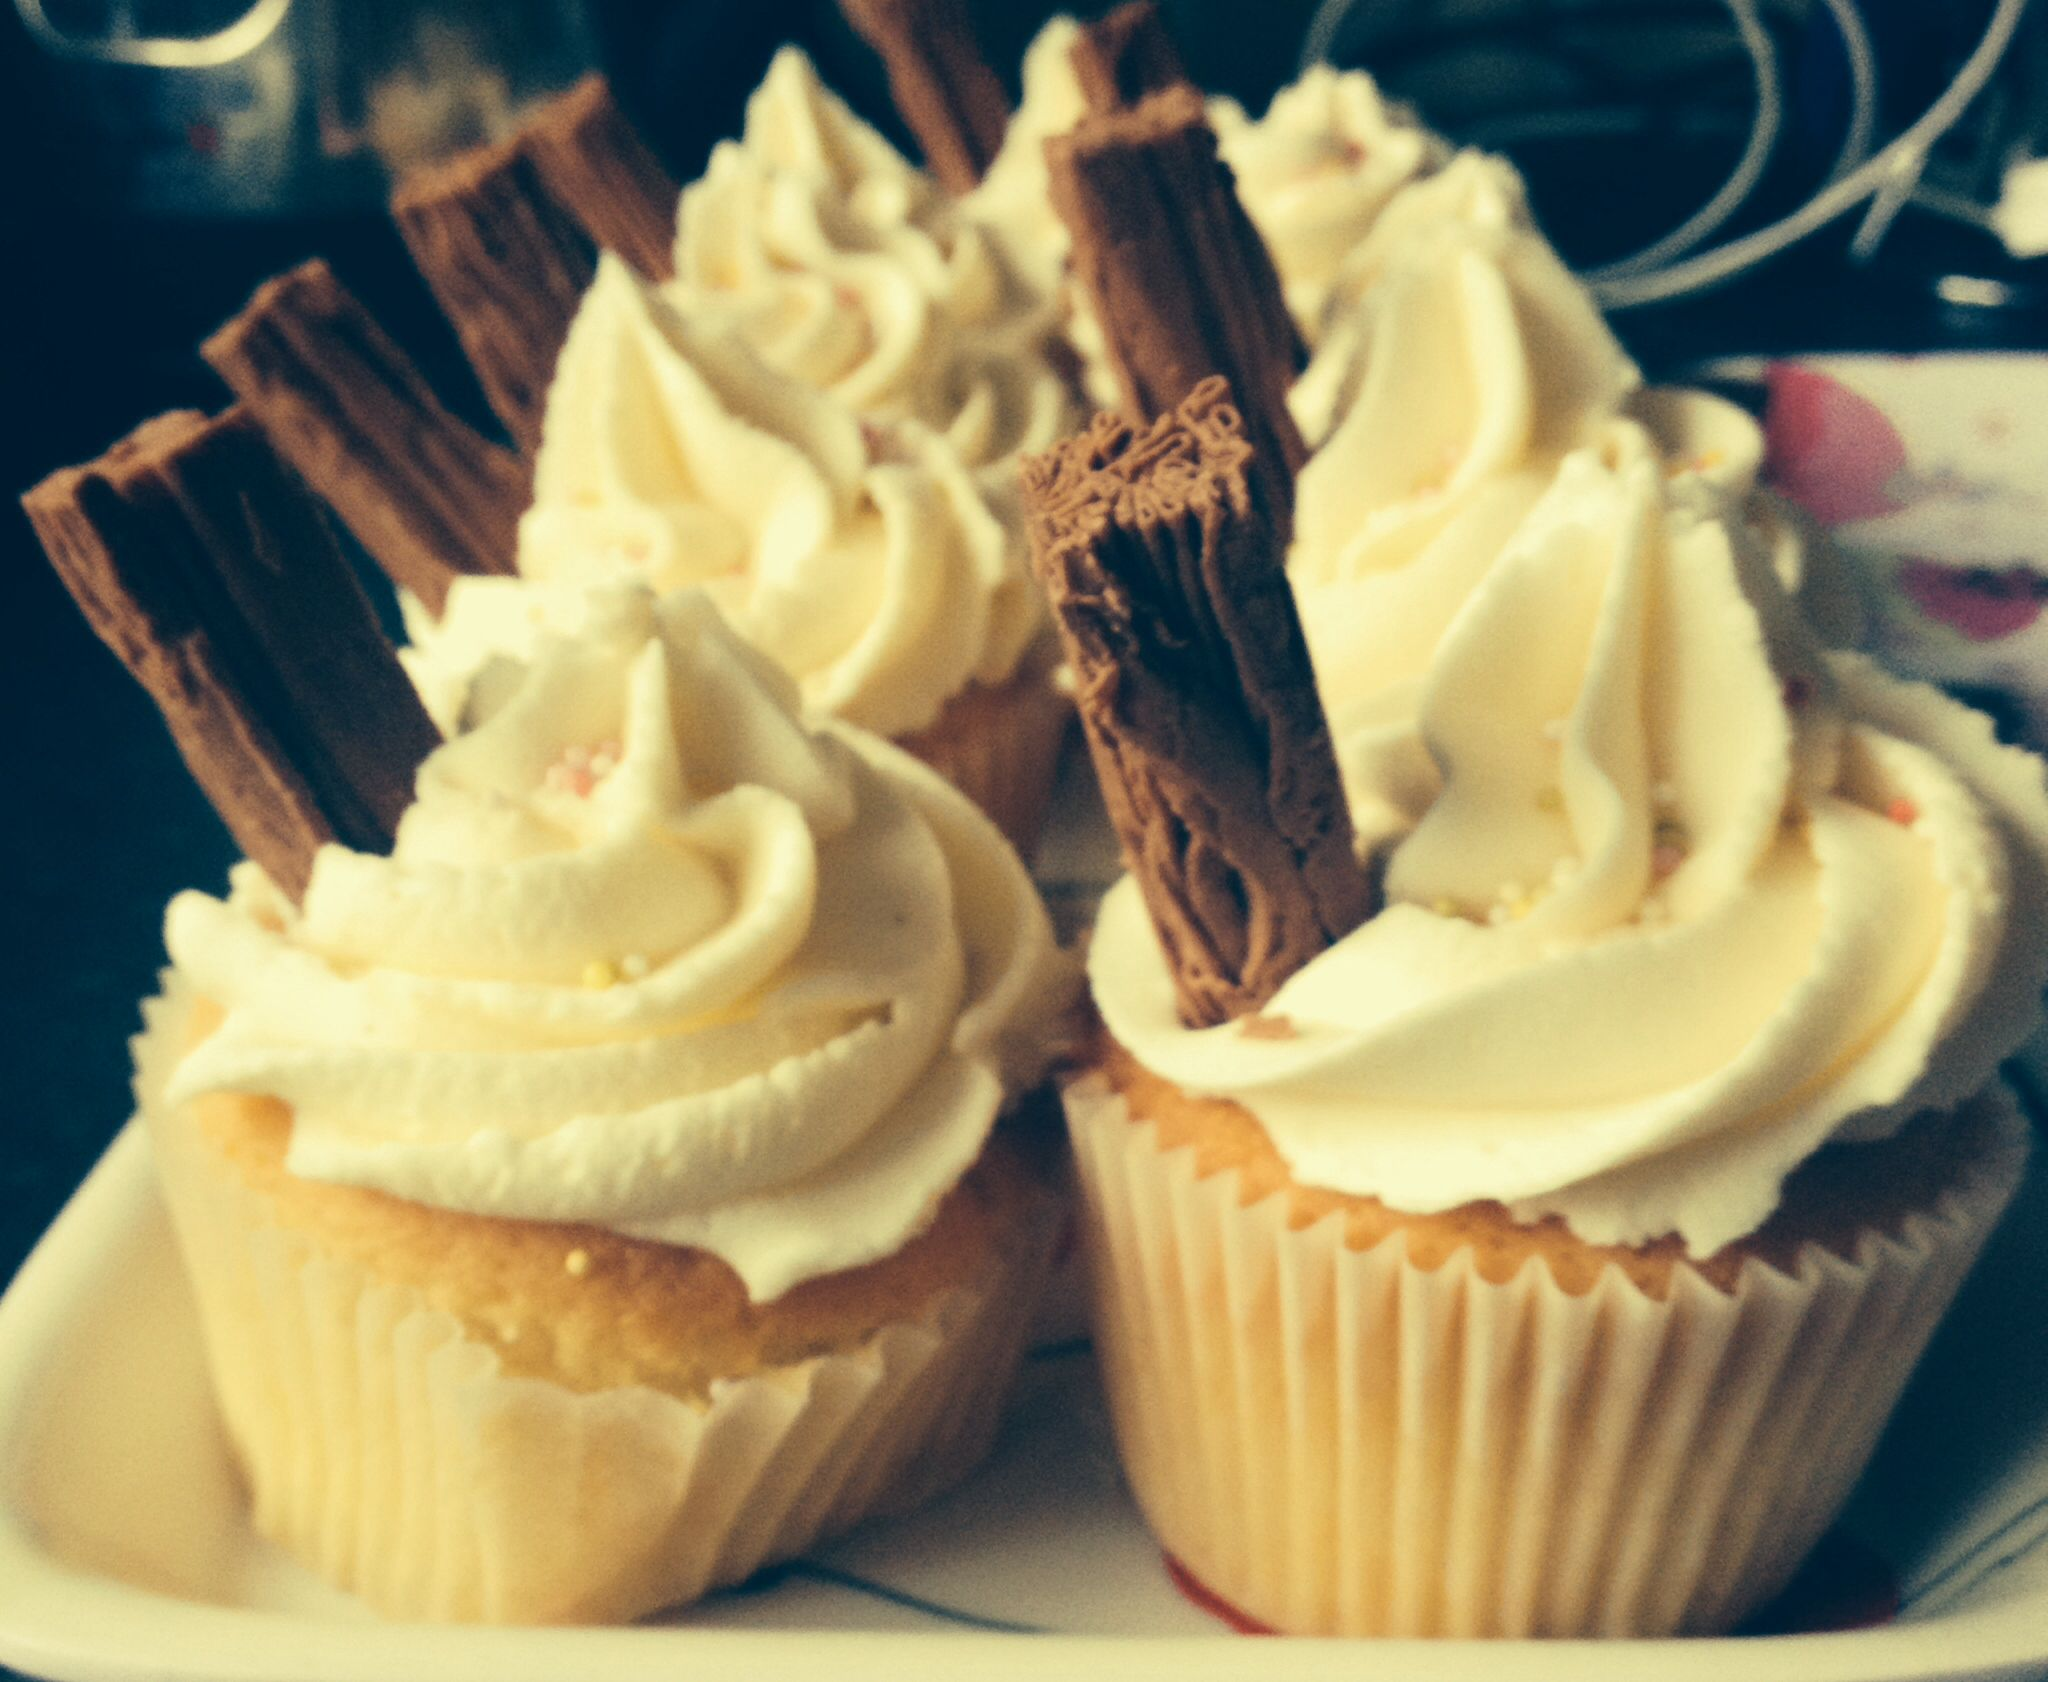 Vanilla ice cream cupcakes | Birthday & wedding cakes - Nicola ...